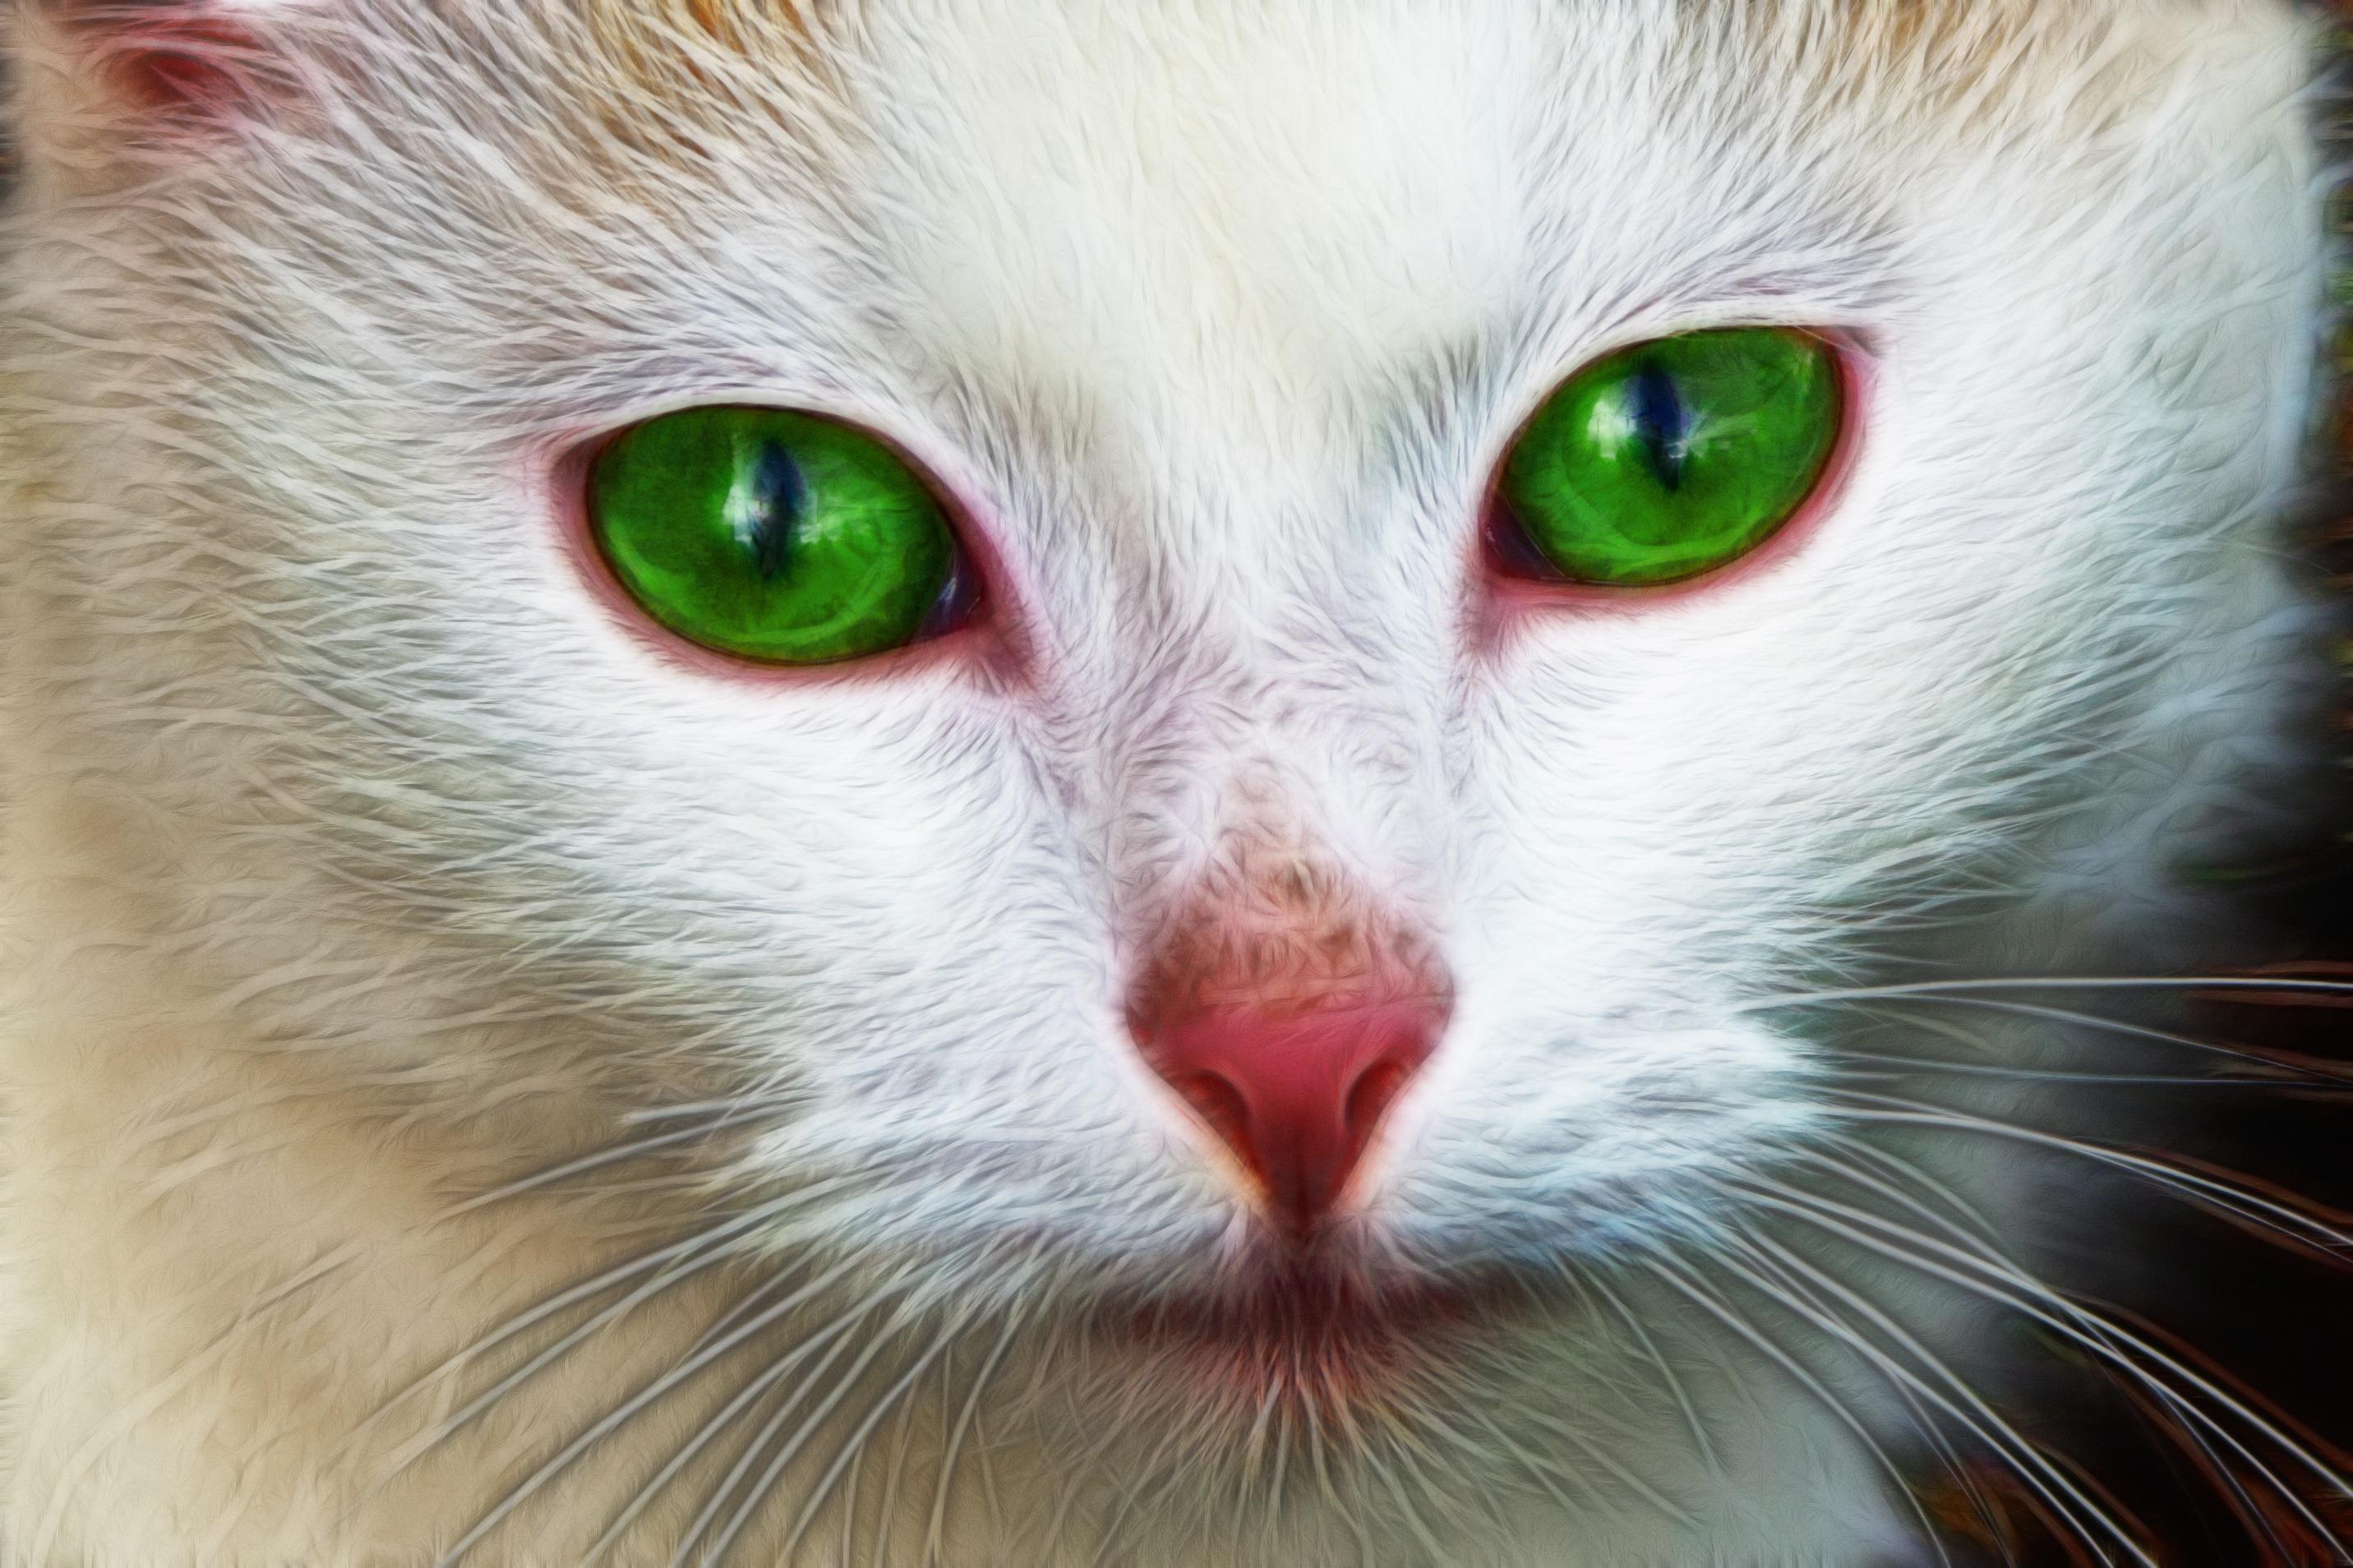 Free nature white animal pet portrait kitten